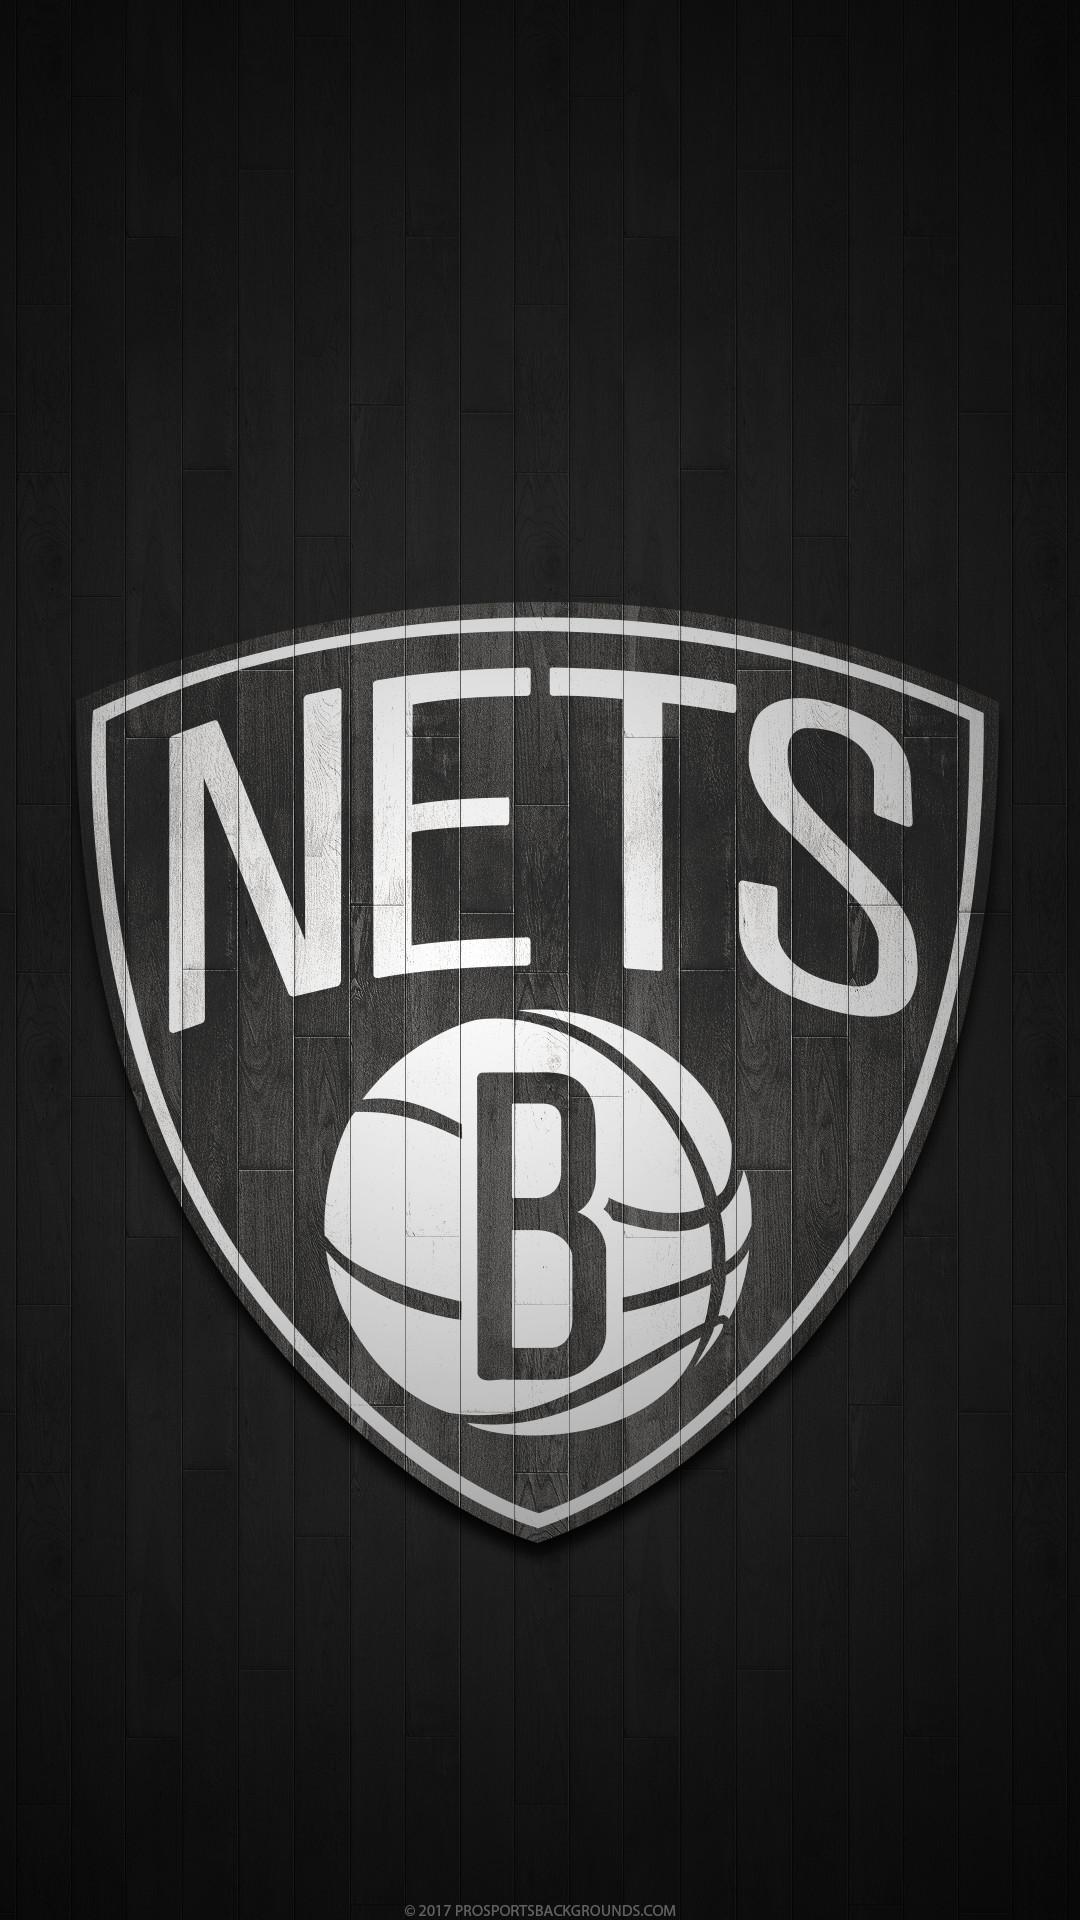 Brooklyn nets wallpapers wallpapertag - Iphone 4 basketball wallpaper ...